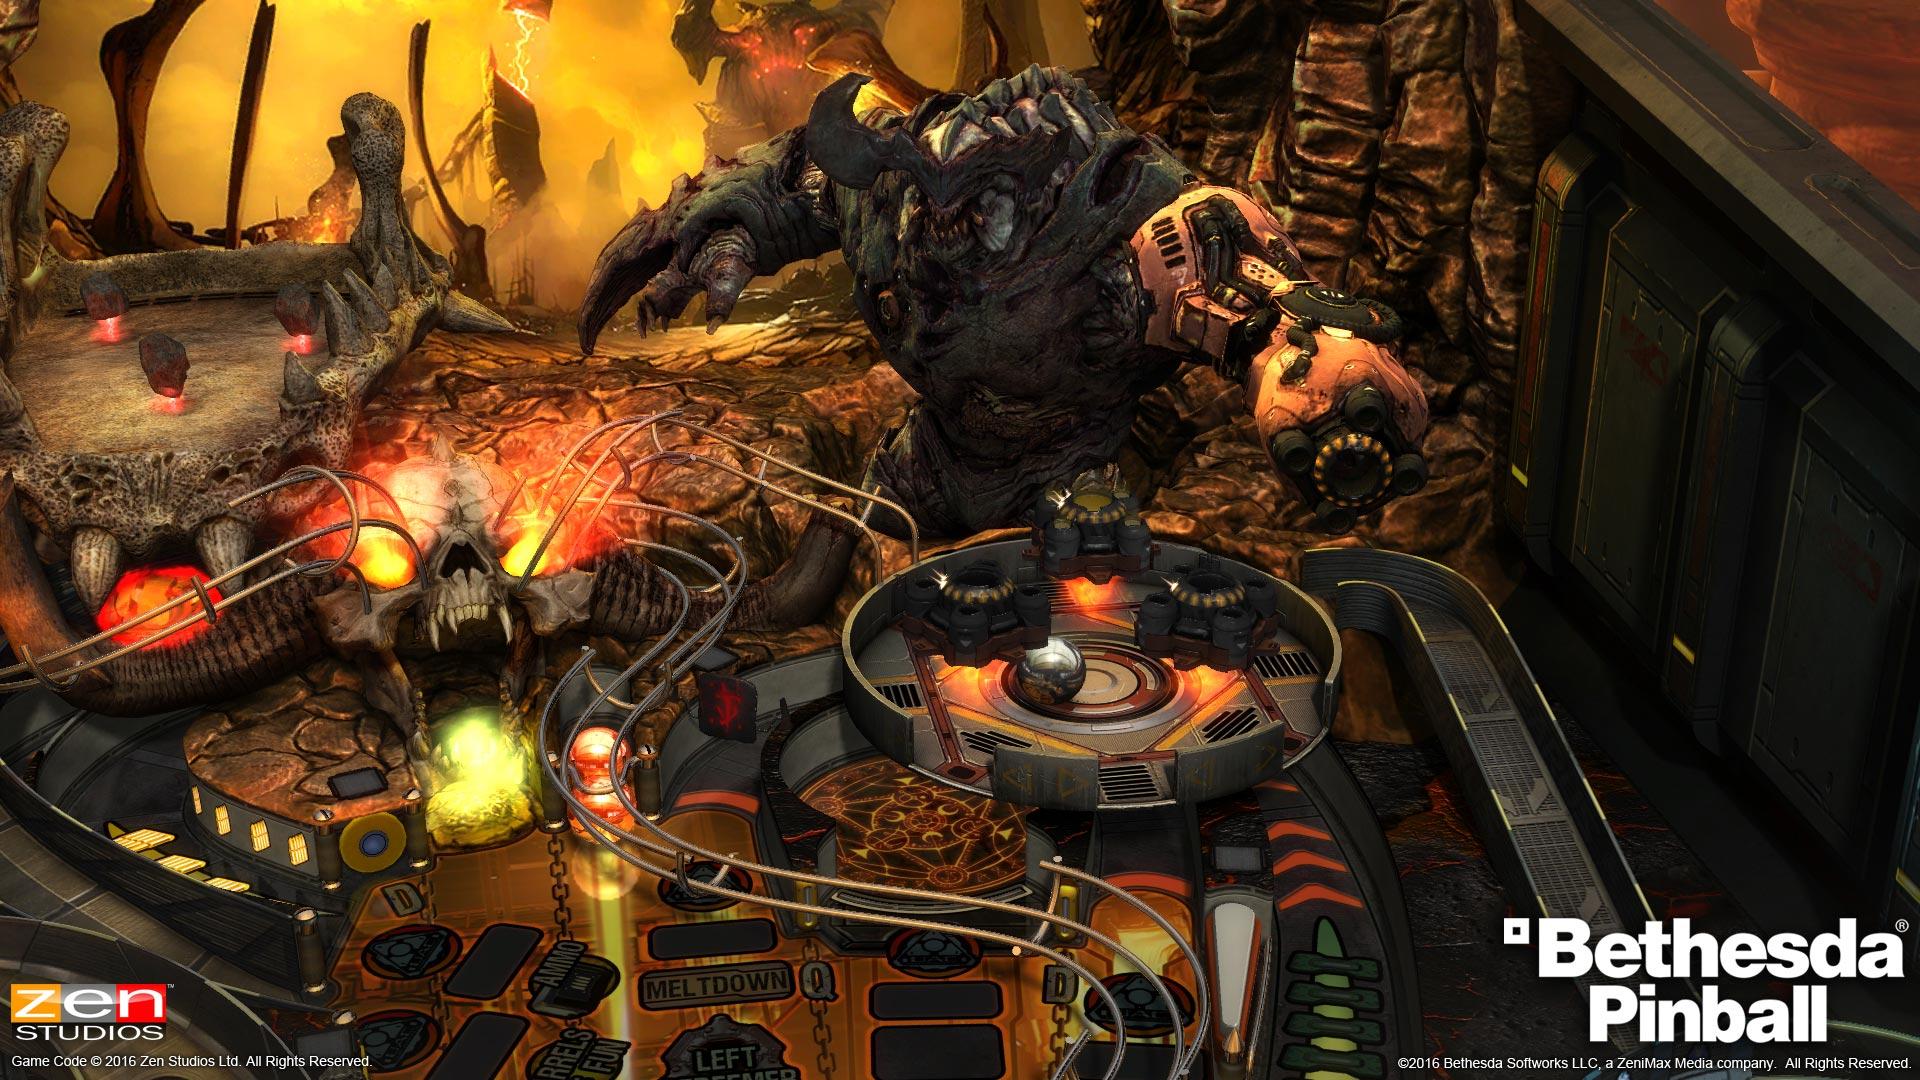 Bethesda Pinball Games Announced by Zen Studios - Gaming Central